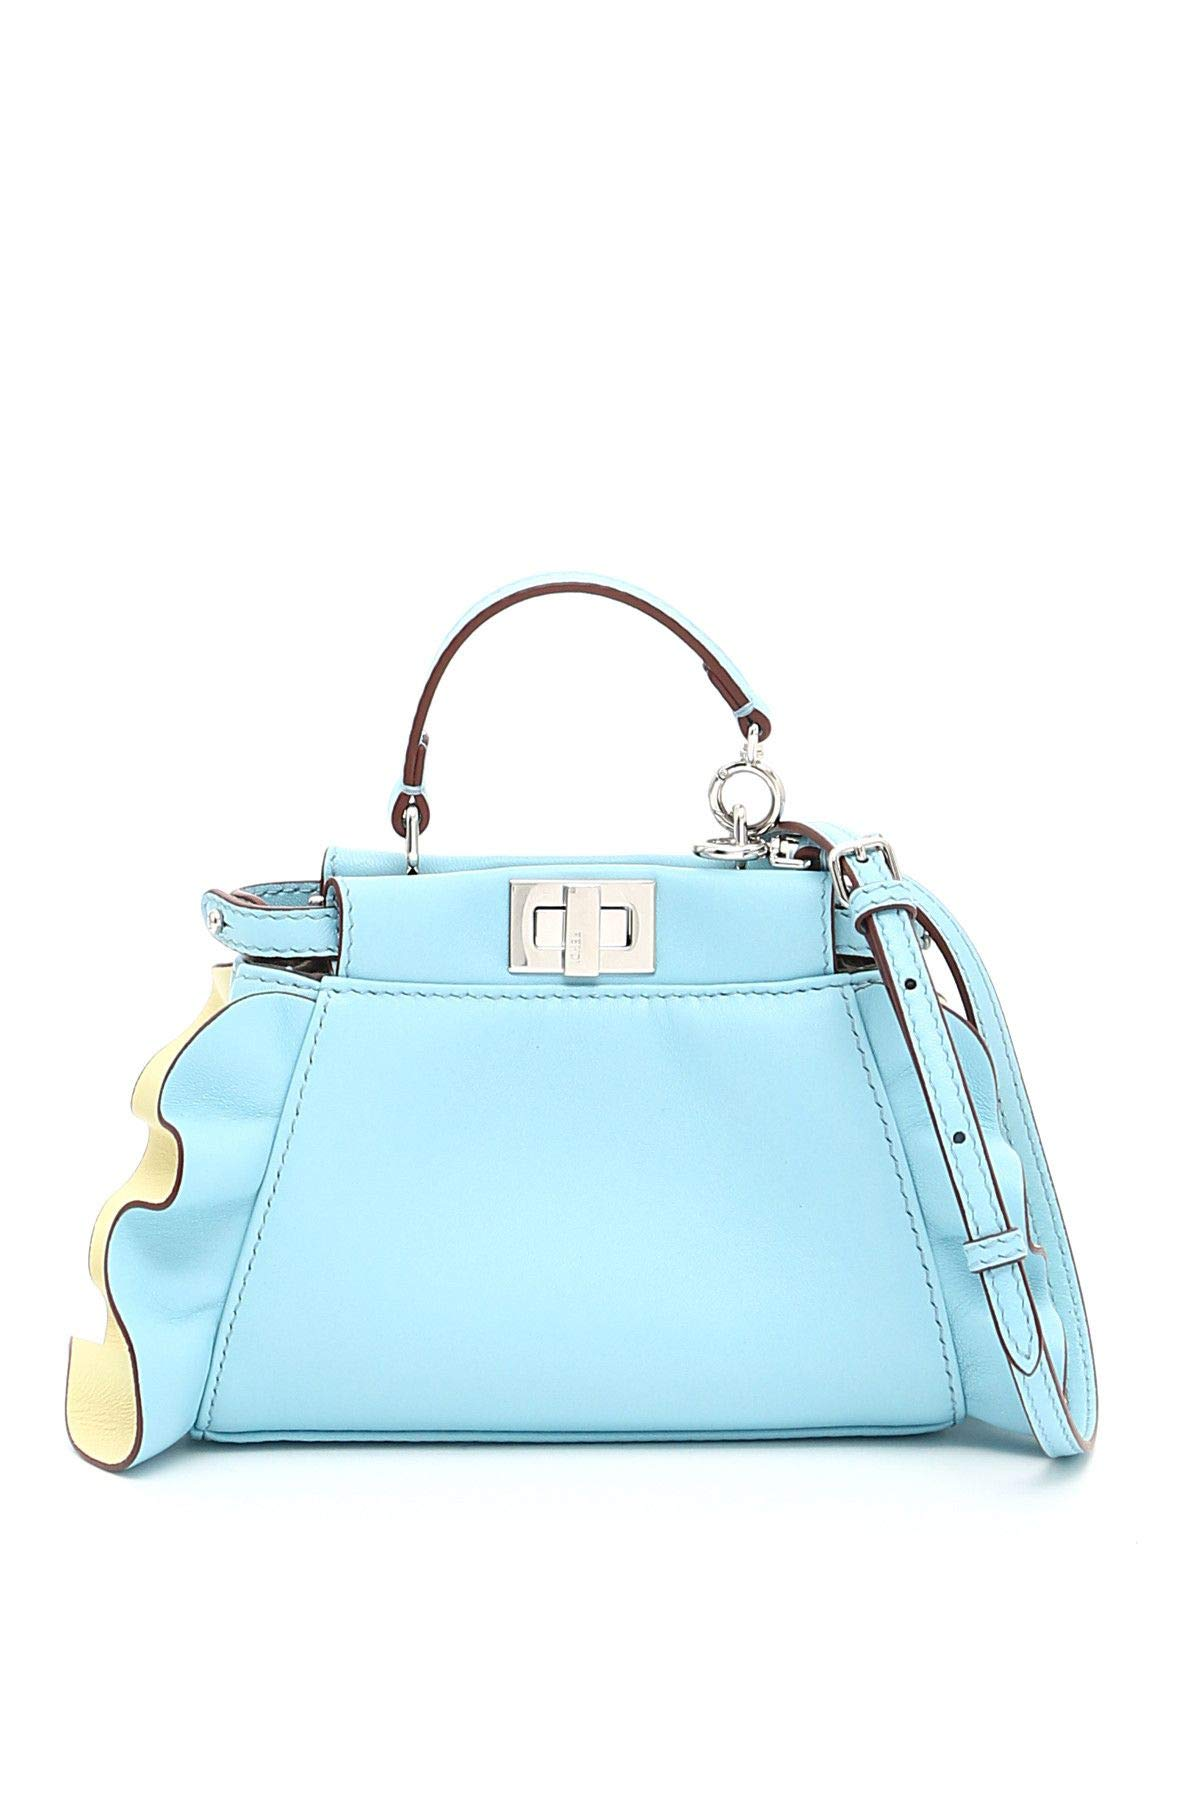 Fendi Women's 8M0355s3zf06mz-Mcf Light Blue Leather Shoulder Bag